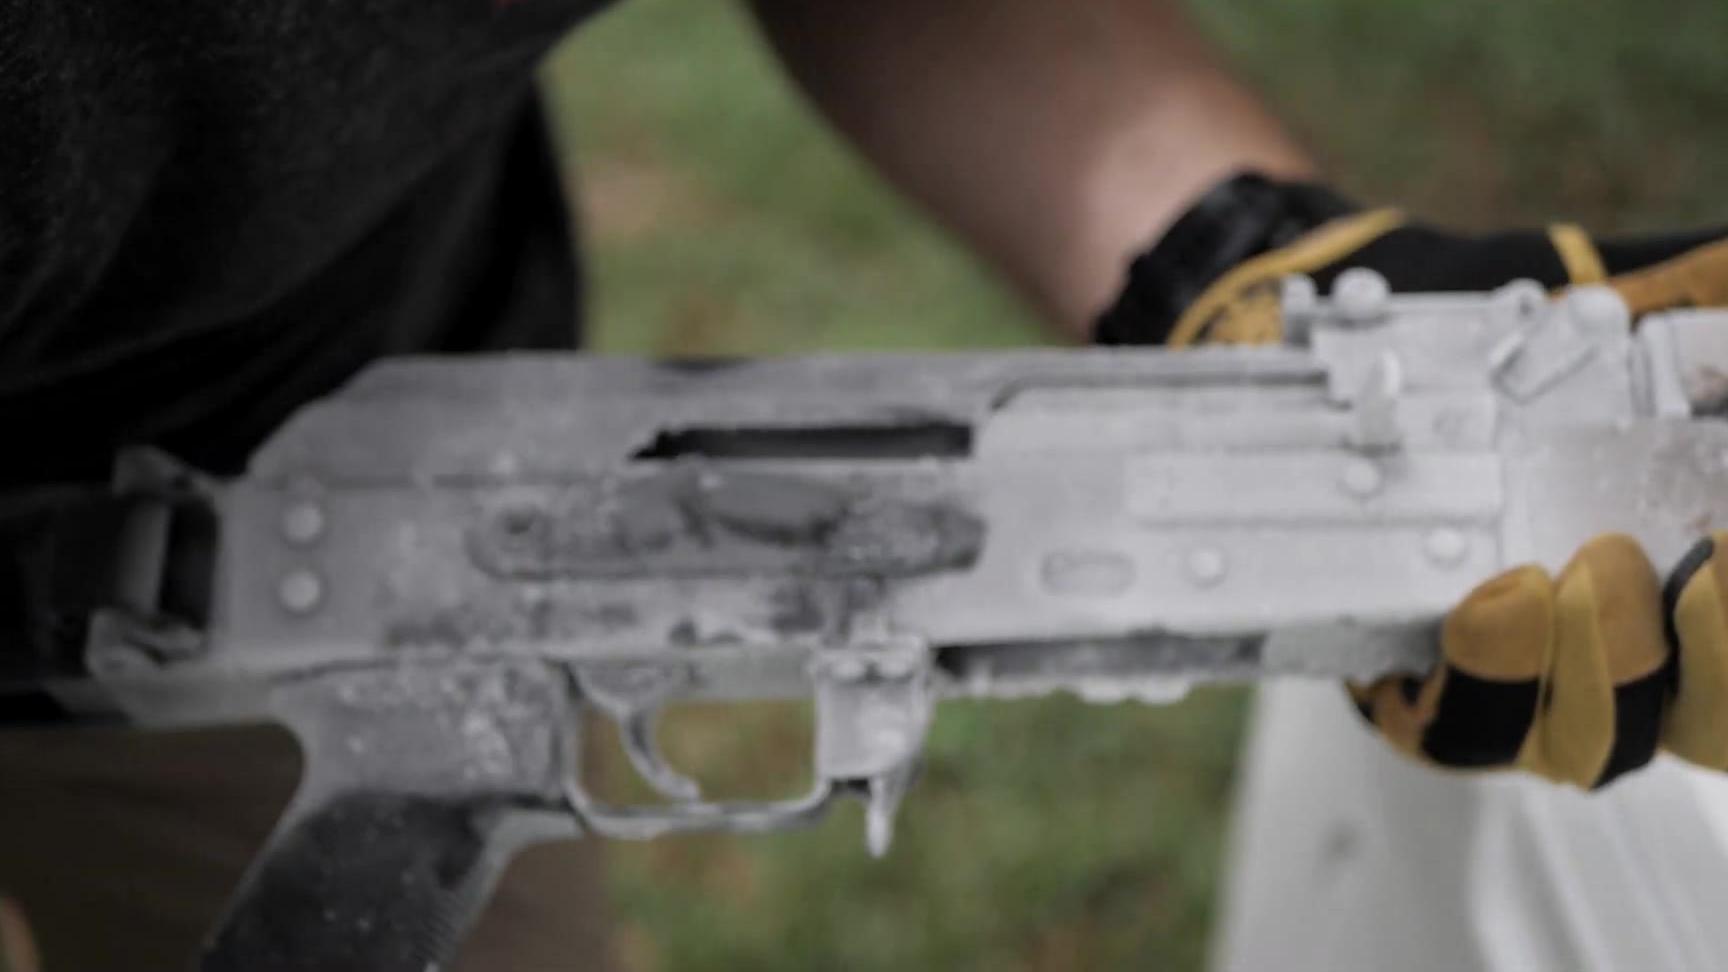 【TFB TV】低温测试 AR15 vs. AK47